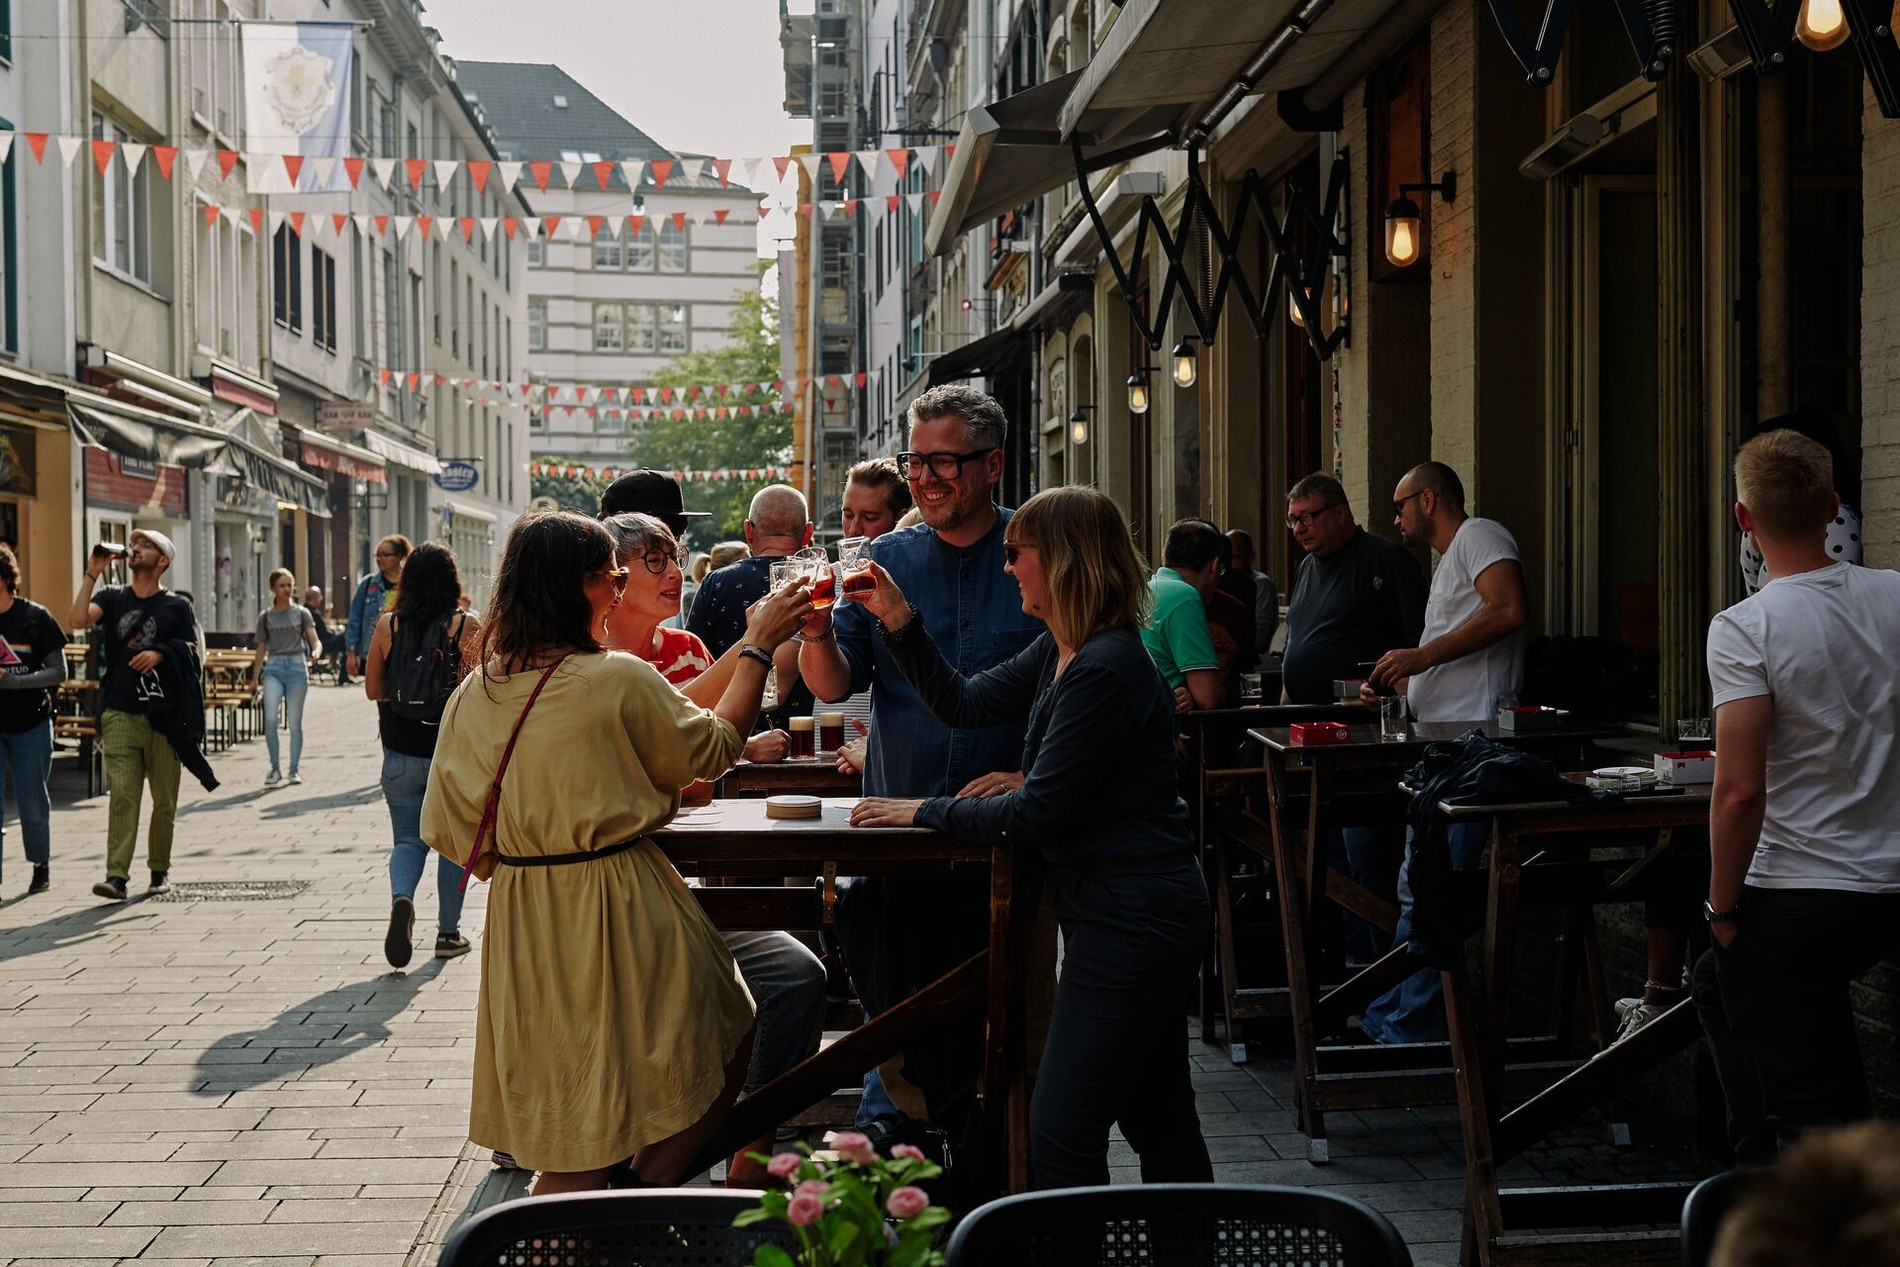 New_Altstadt_Kuerzer_Anstossen